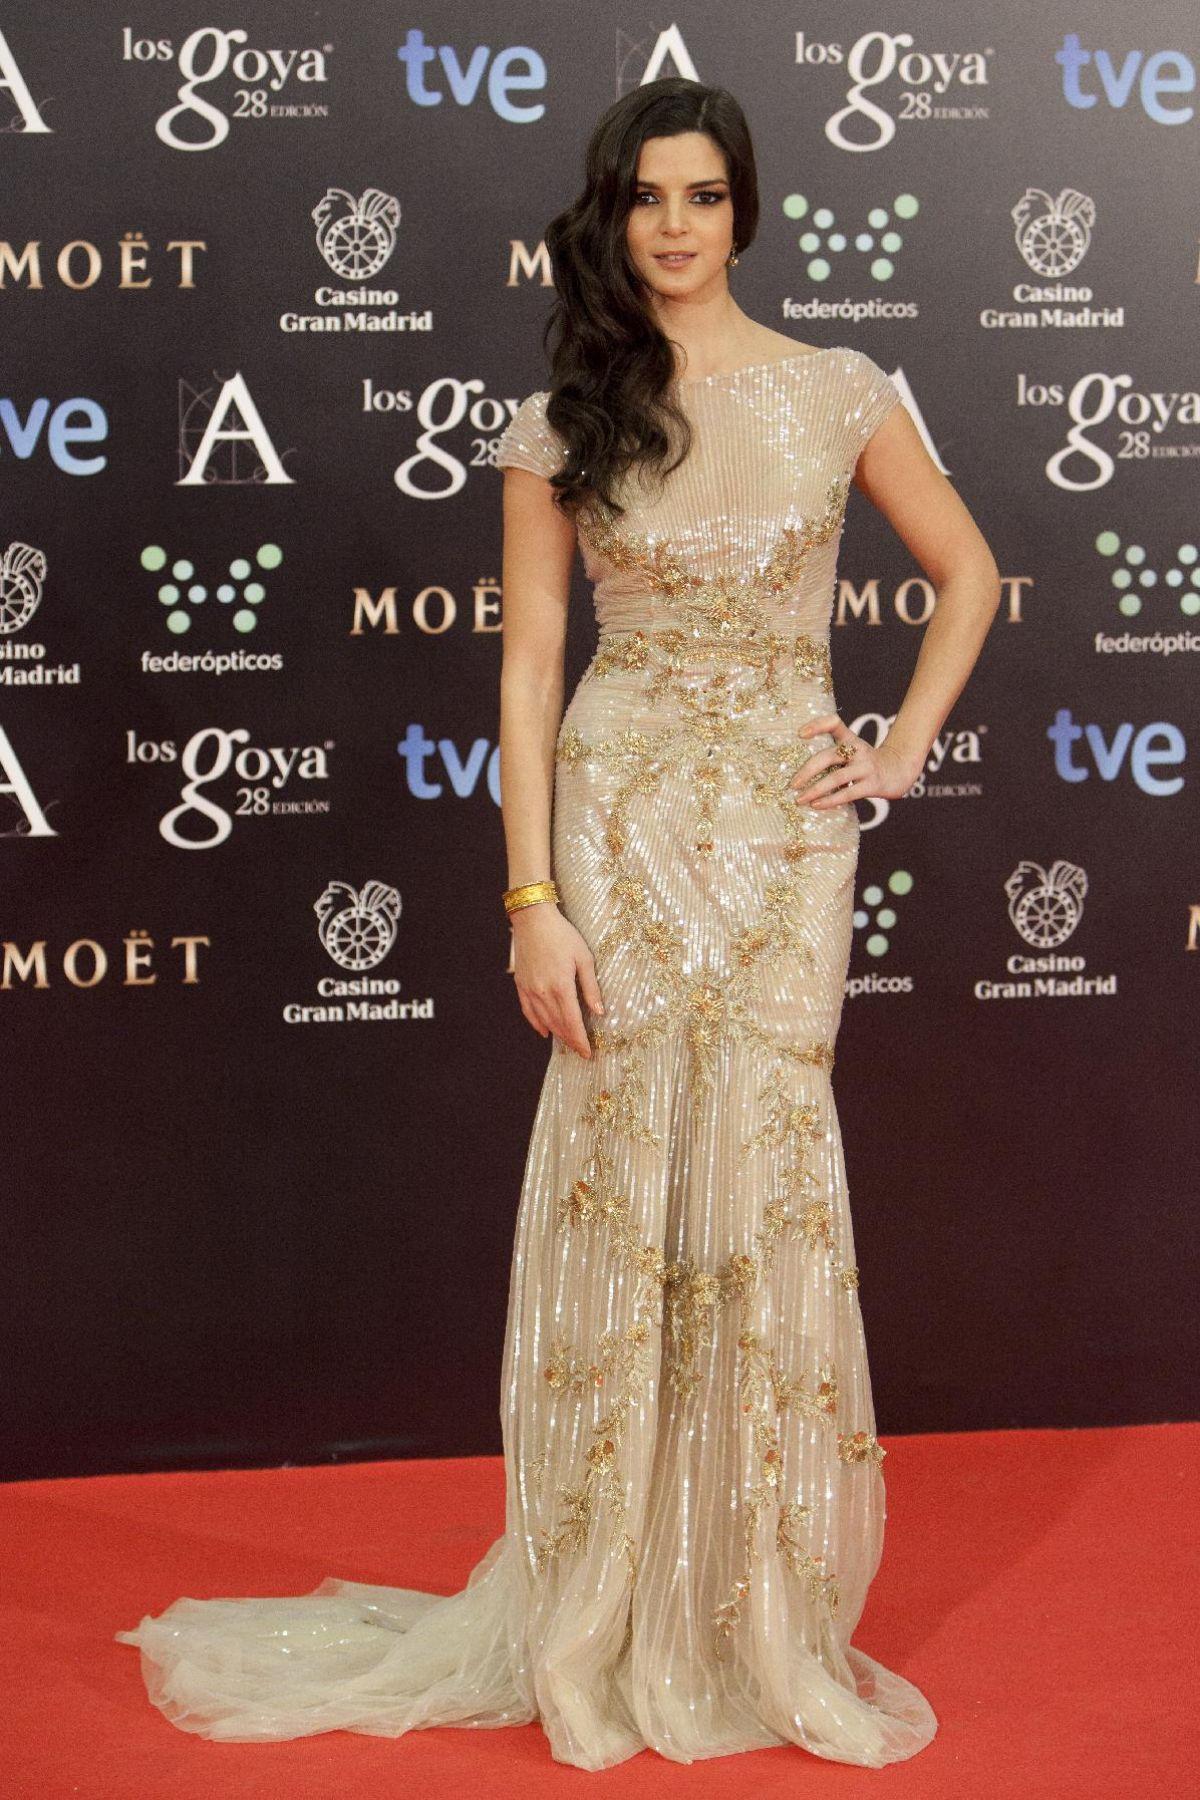 CLARA LARGO at 2014 Goya Film Awards in Madrid